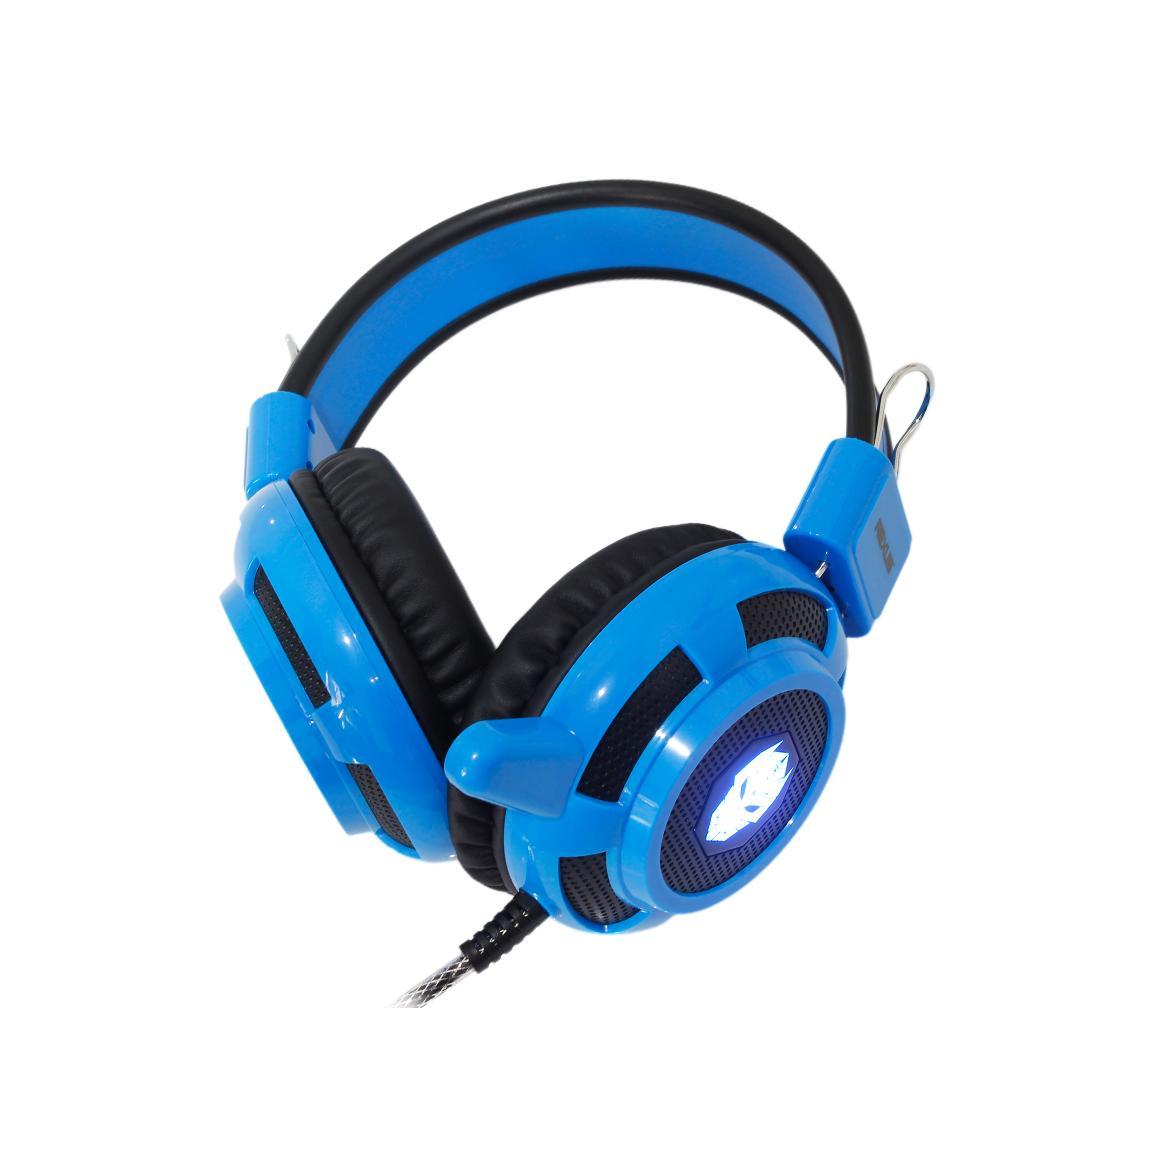 https://www.lazada.co.id/products/rexus-headset-gaming-vonix-f26-f-26-f-26-headphone-head-set-ea-phone-biru-blue-i101274063-s101461561.html